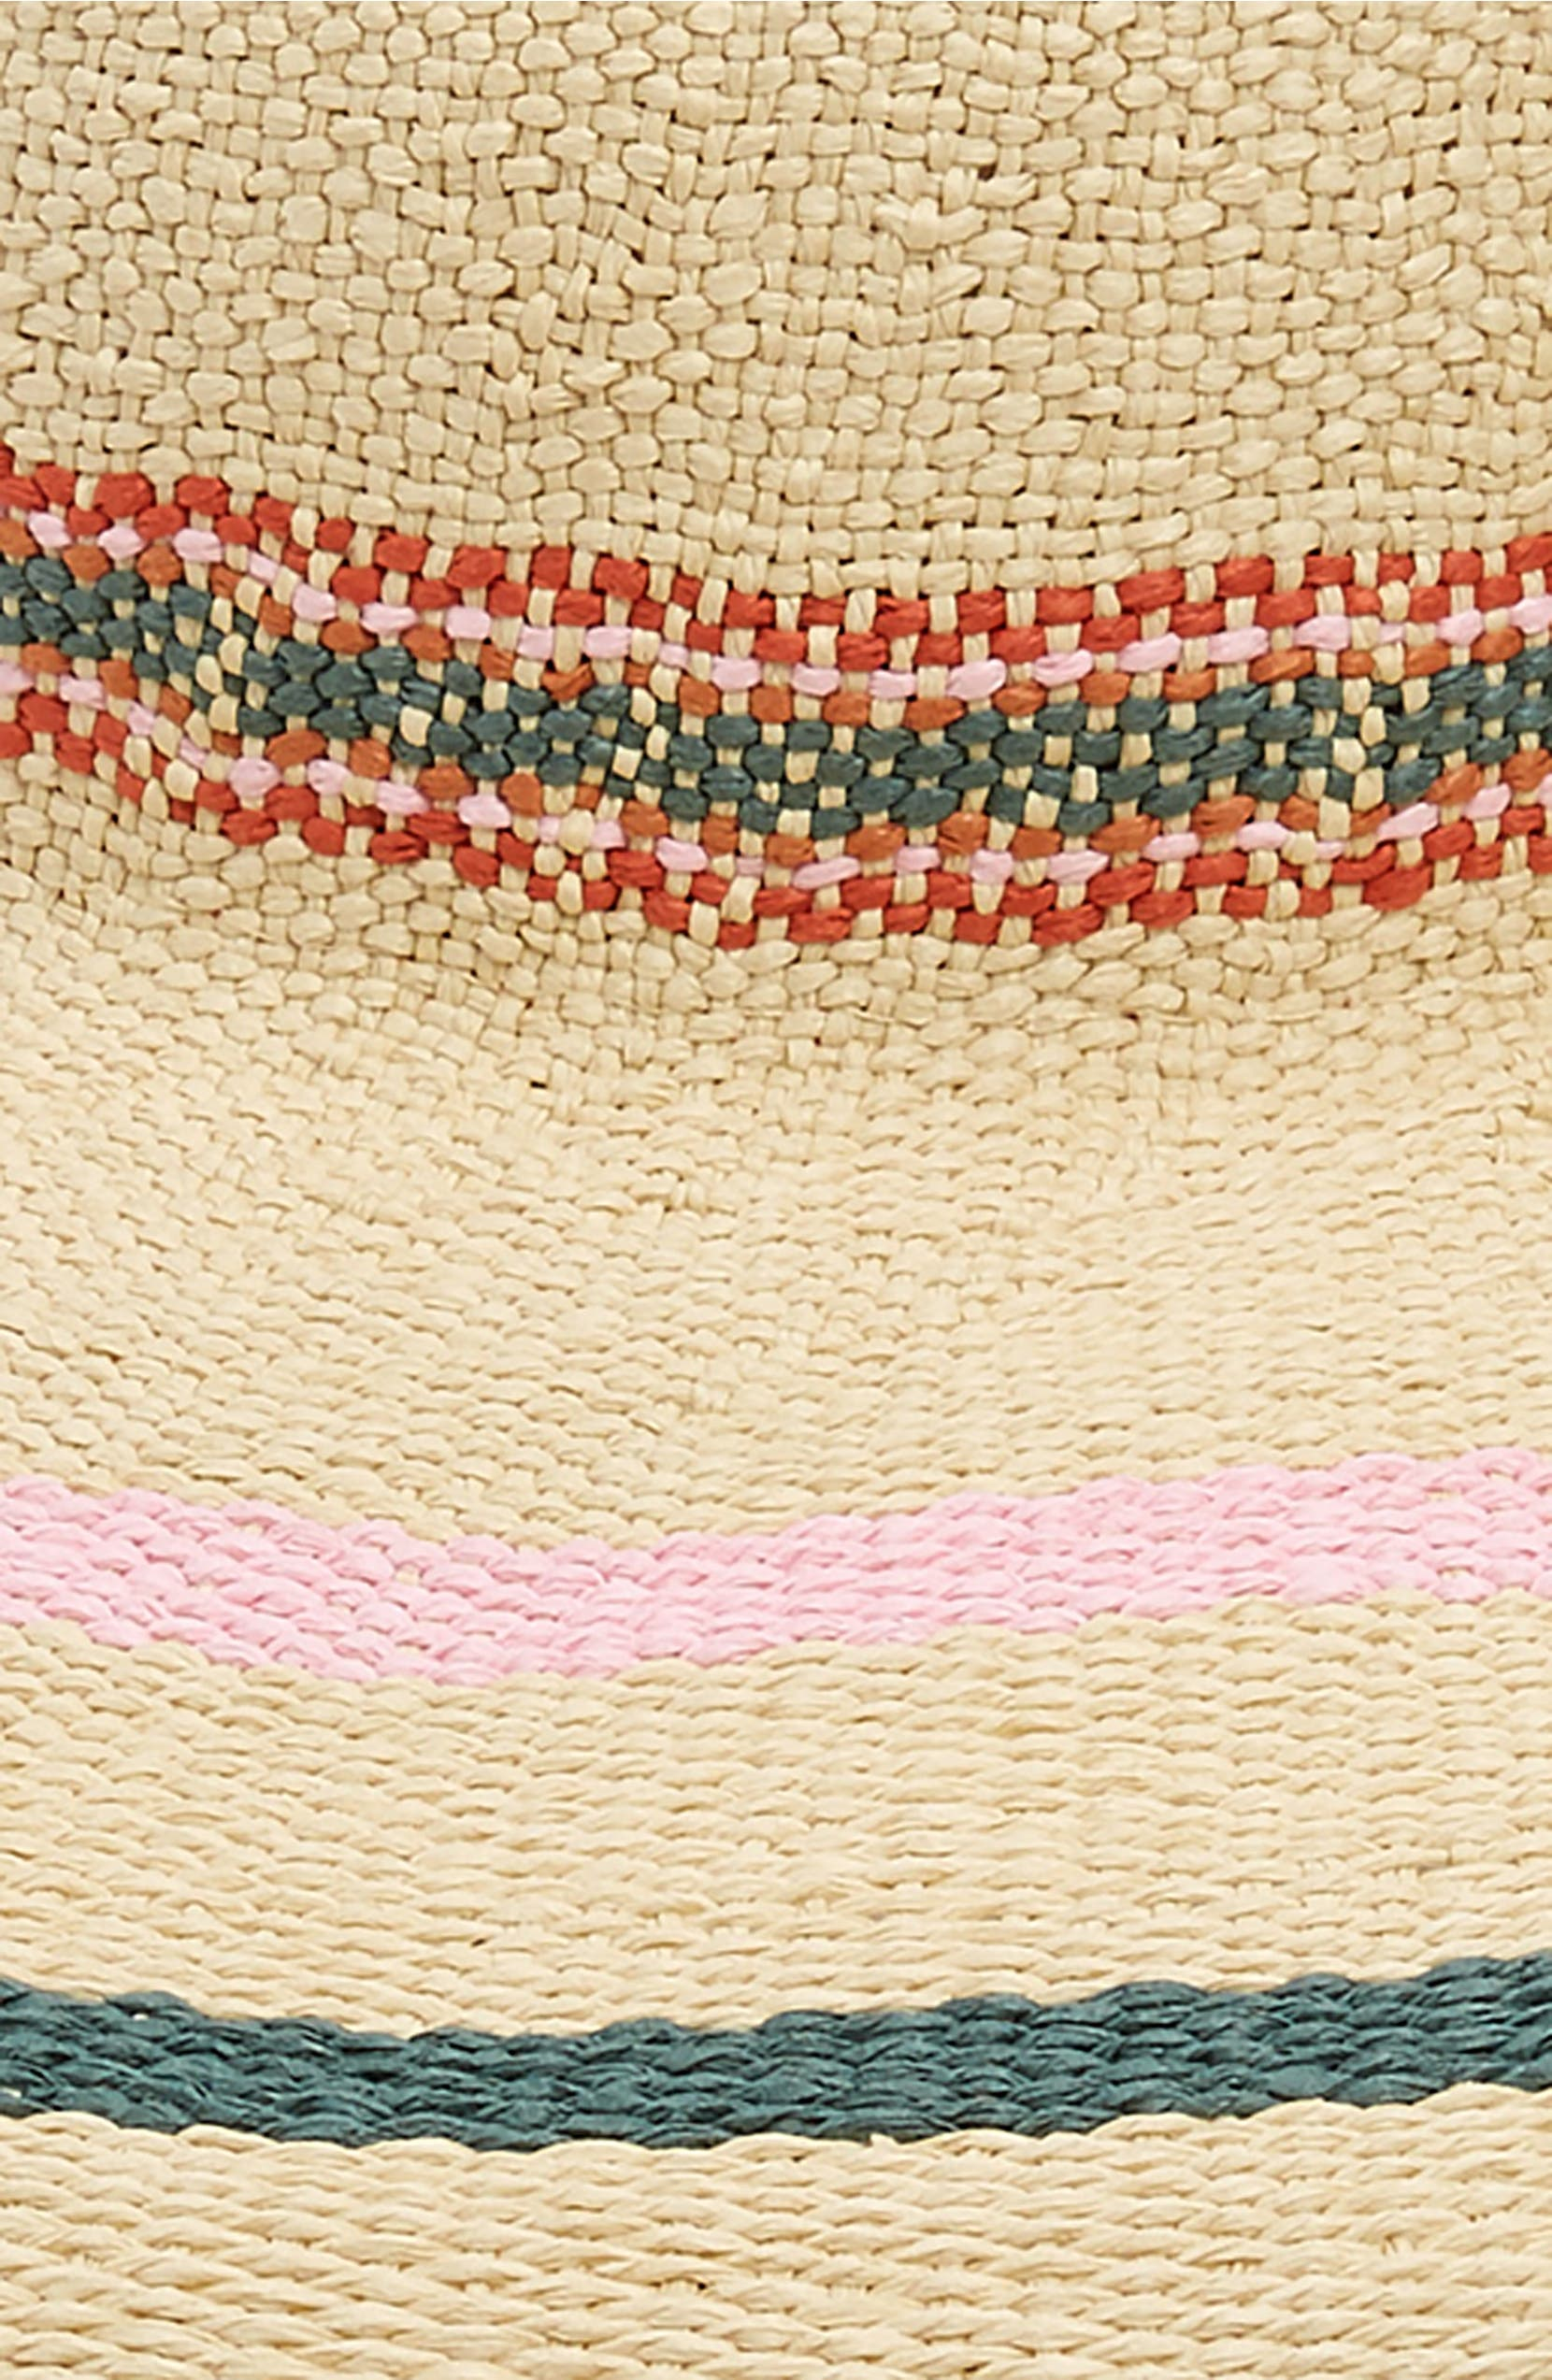 bb997be9e8b Madewell x Biltmore Tulum Stripe Straw Hat